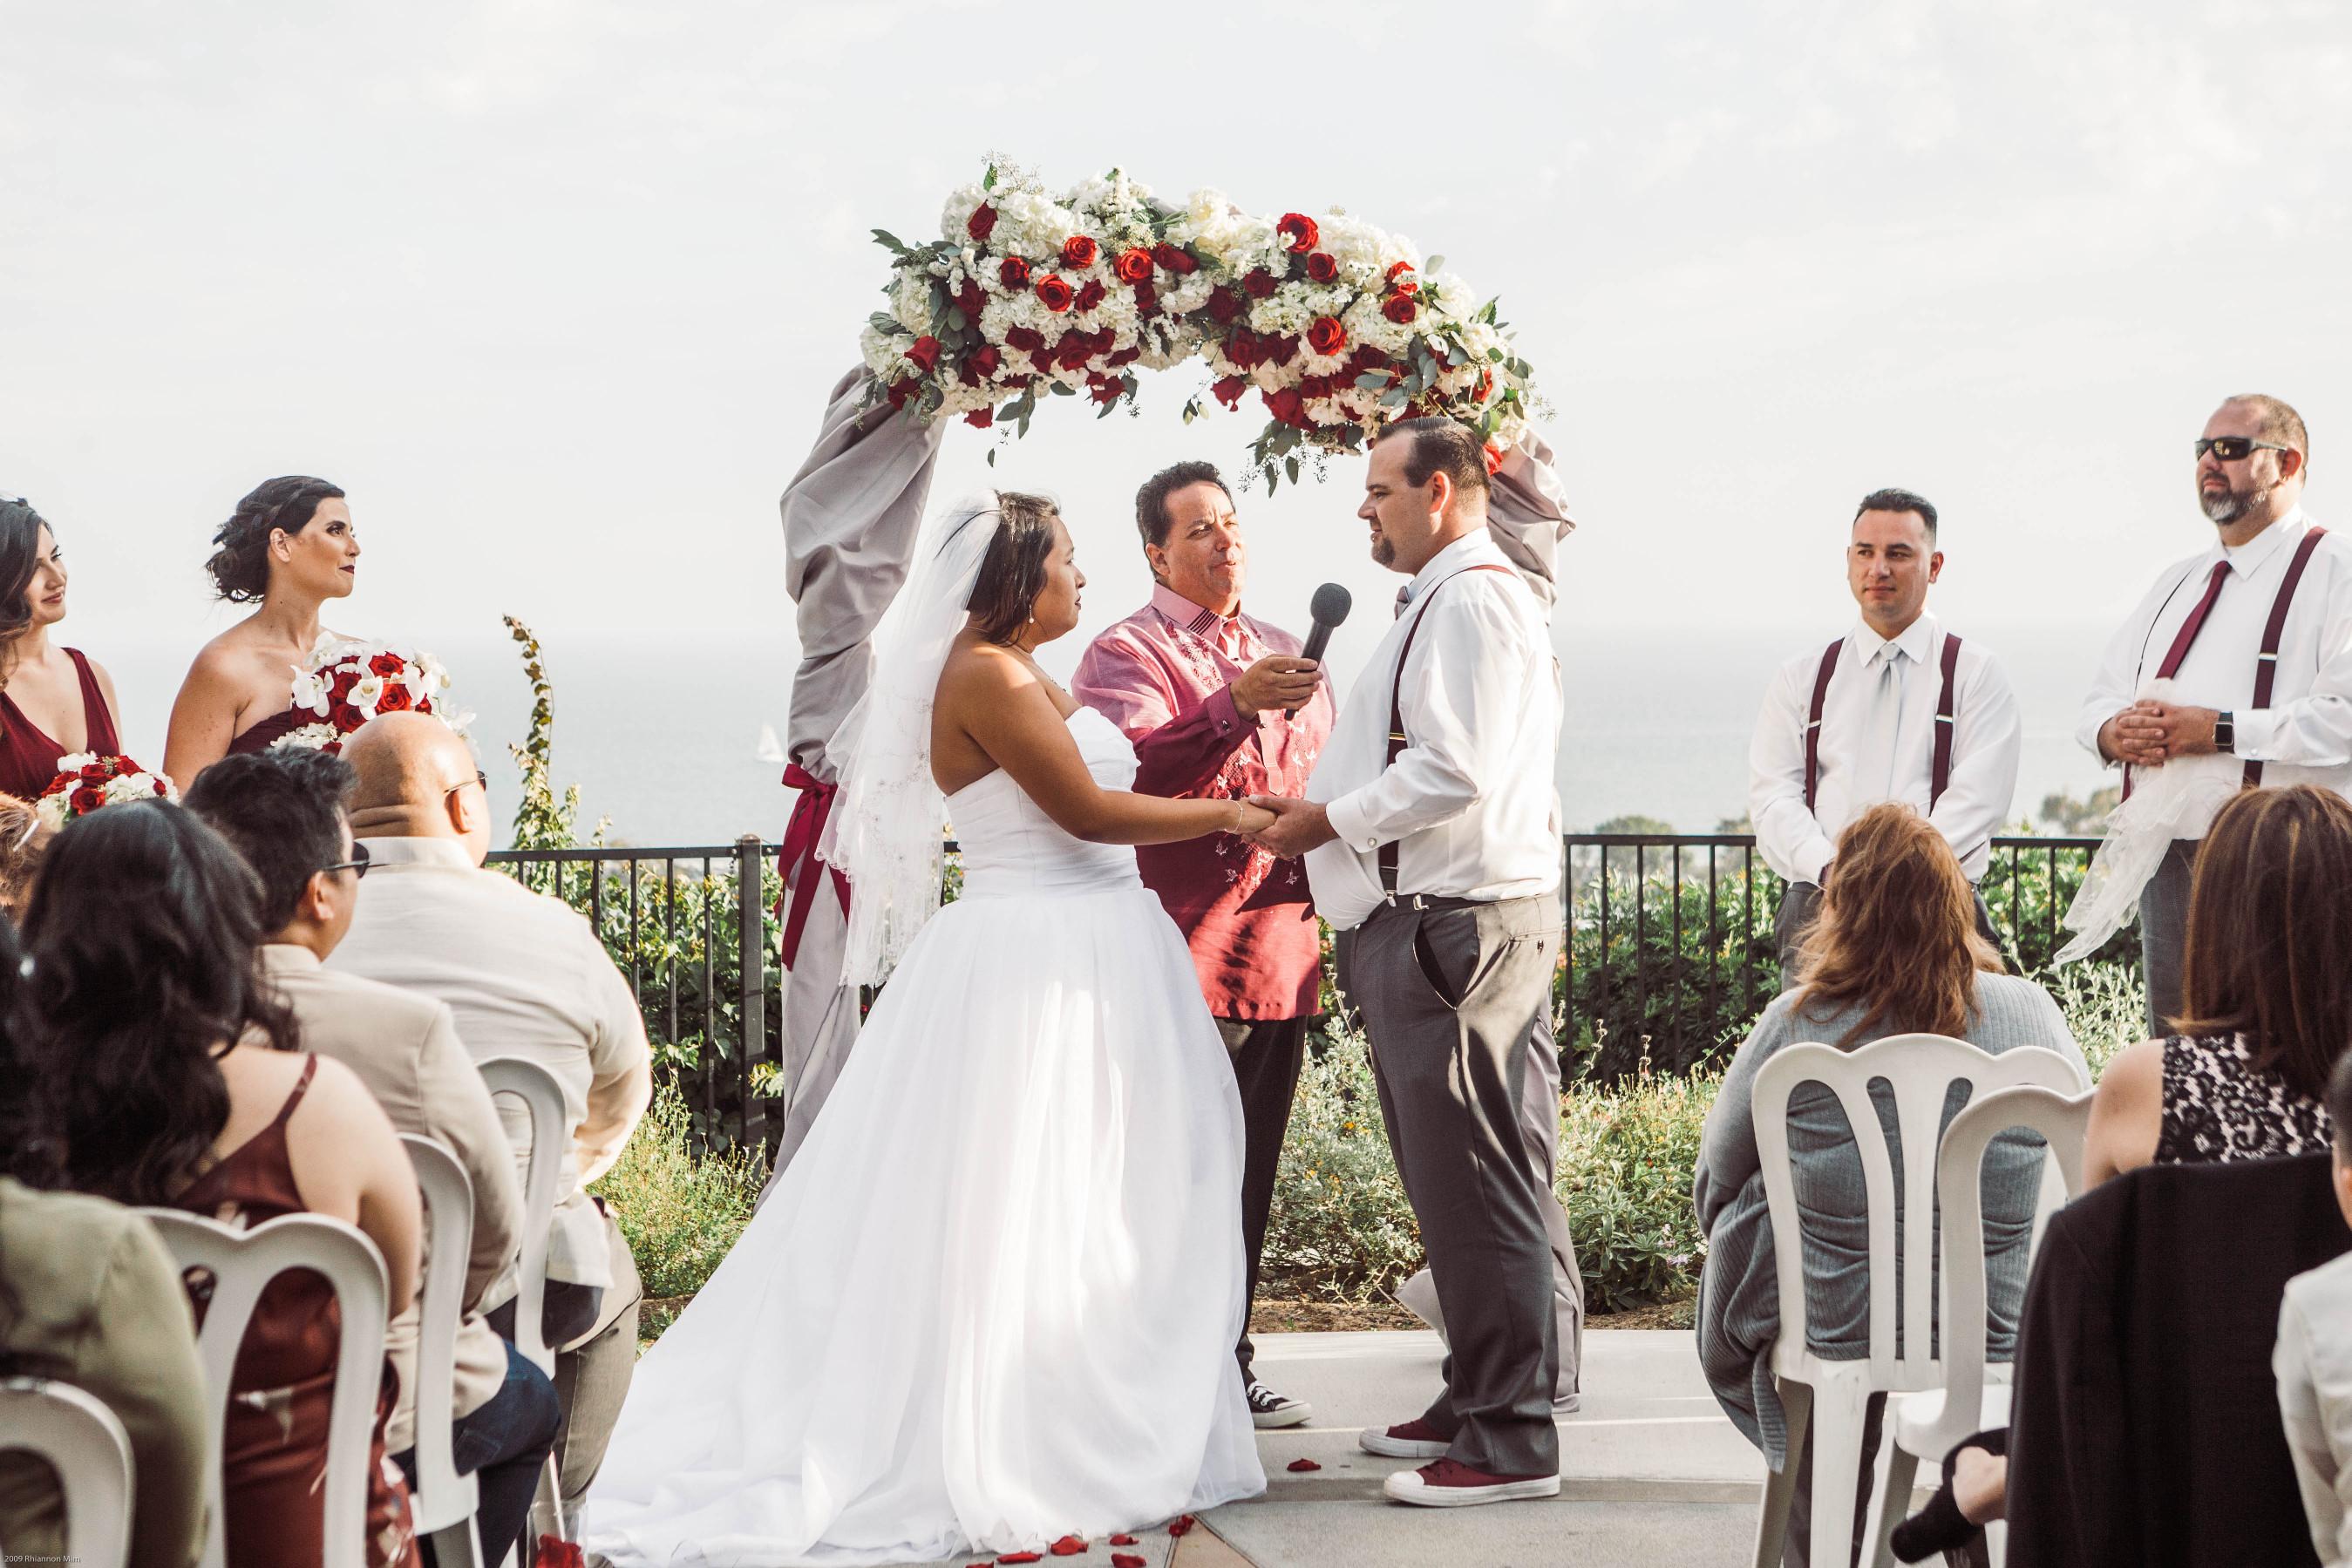 20170909_Wedding_0869